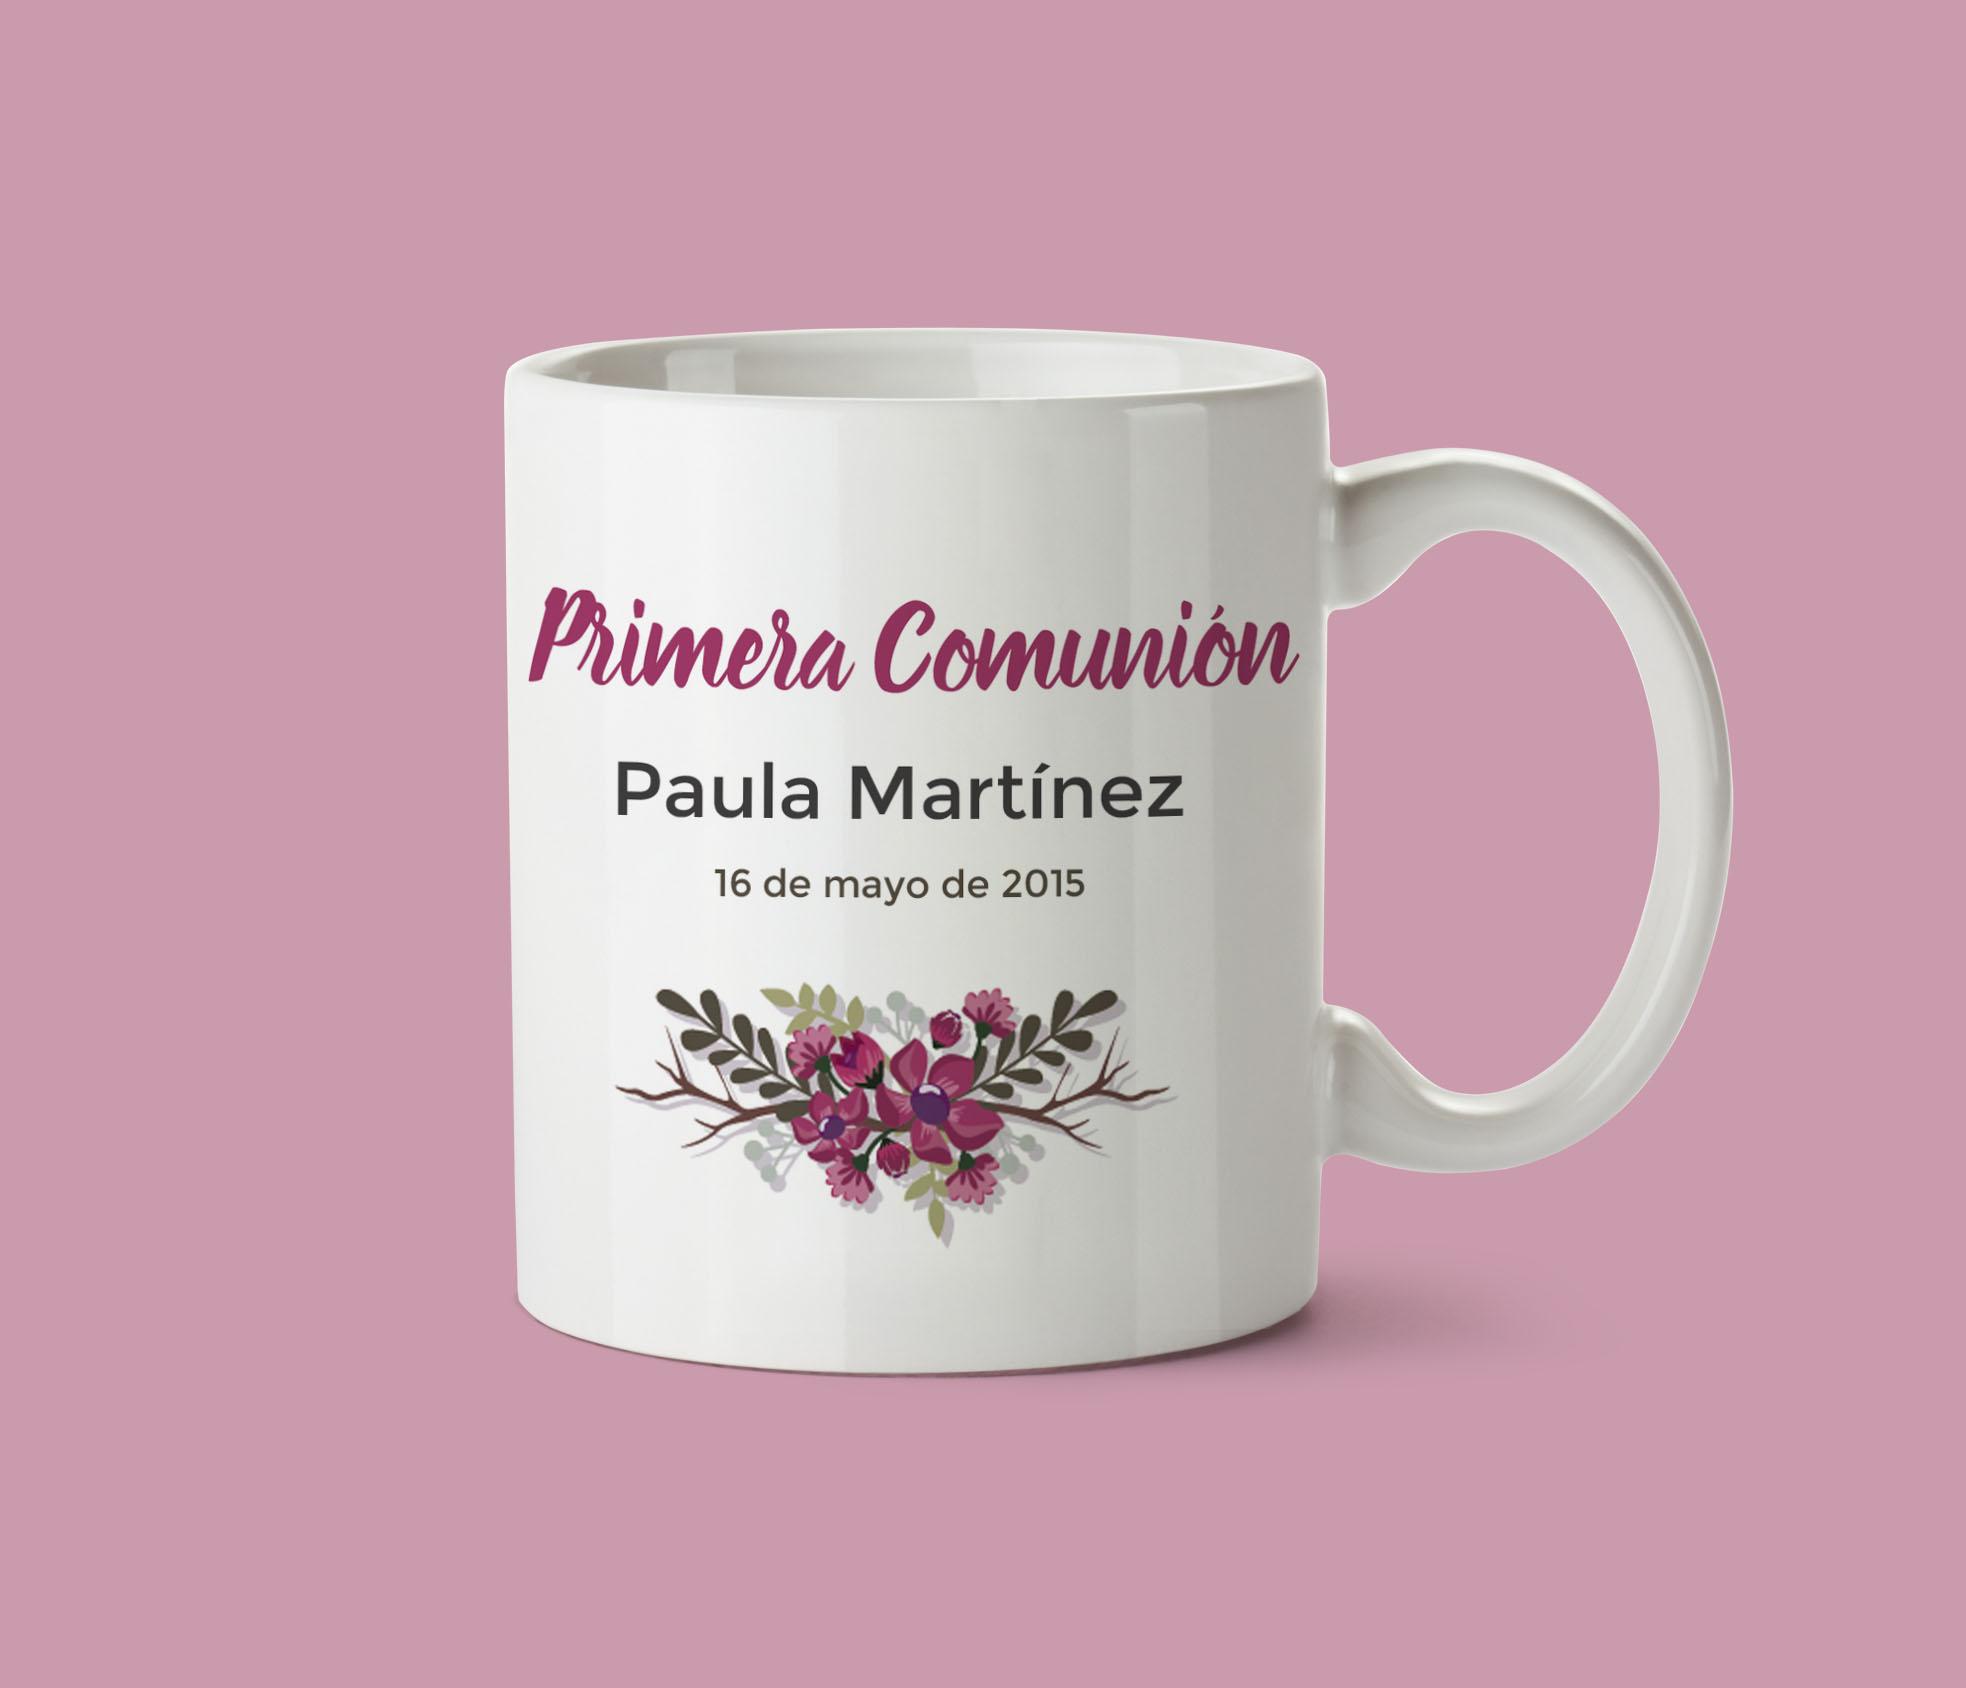 detalles comunion personalizados (2)